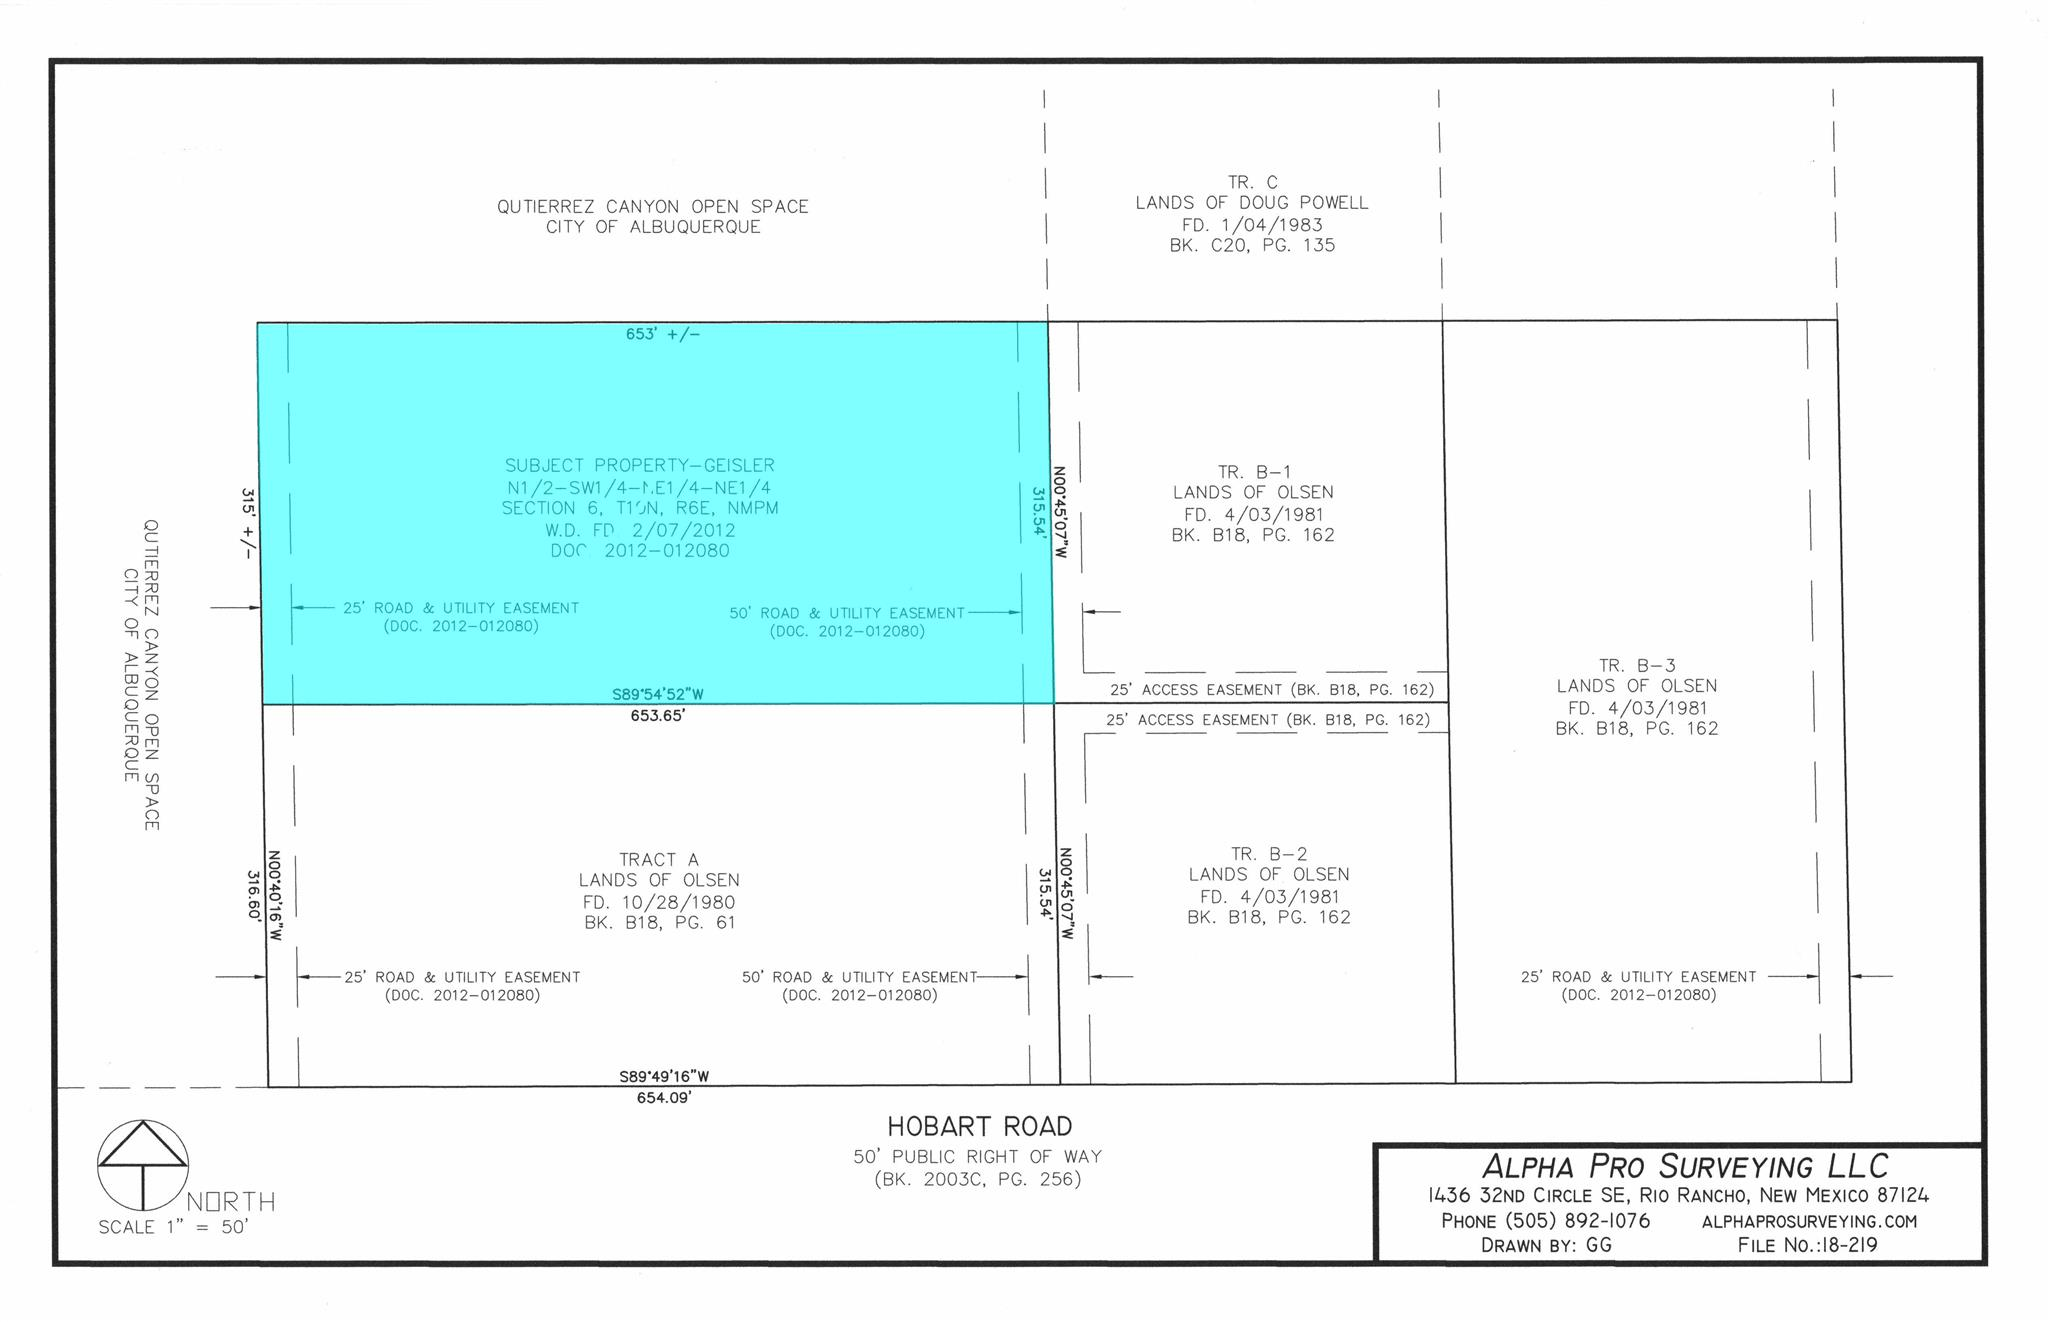 BRNM-3965__Plat_Map_01 -  Edit.jpg